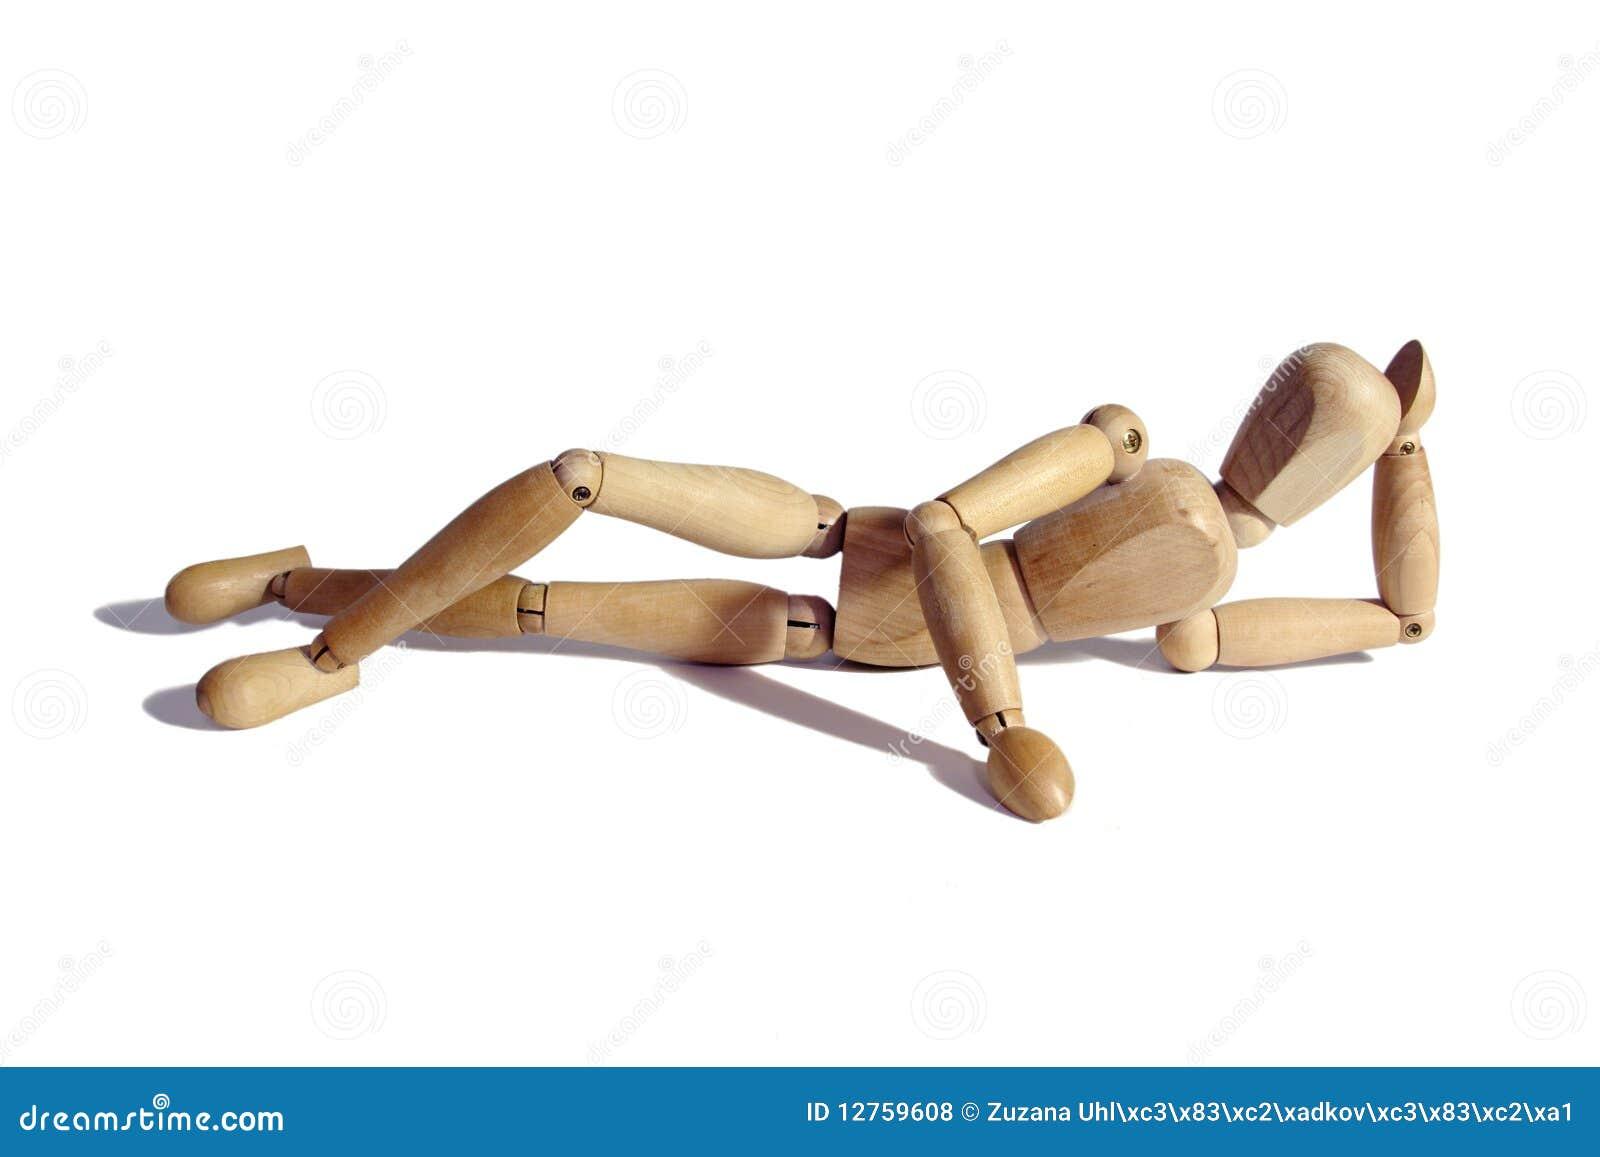 Mannequin drewniany